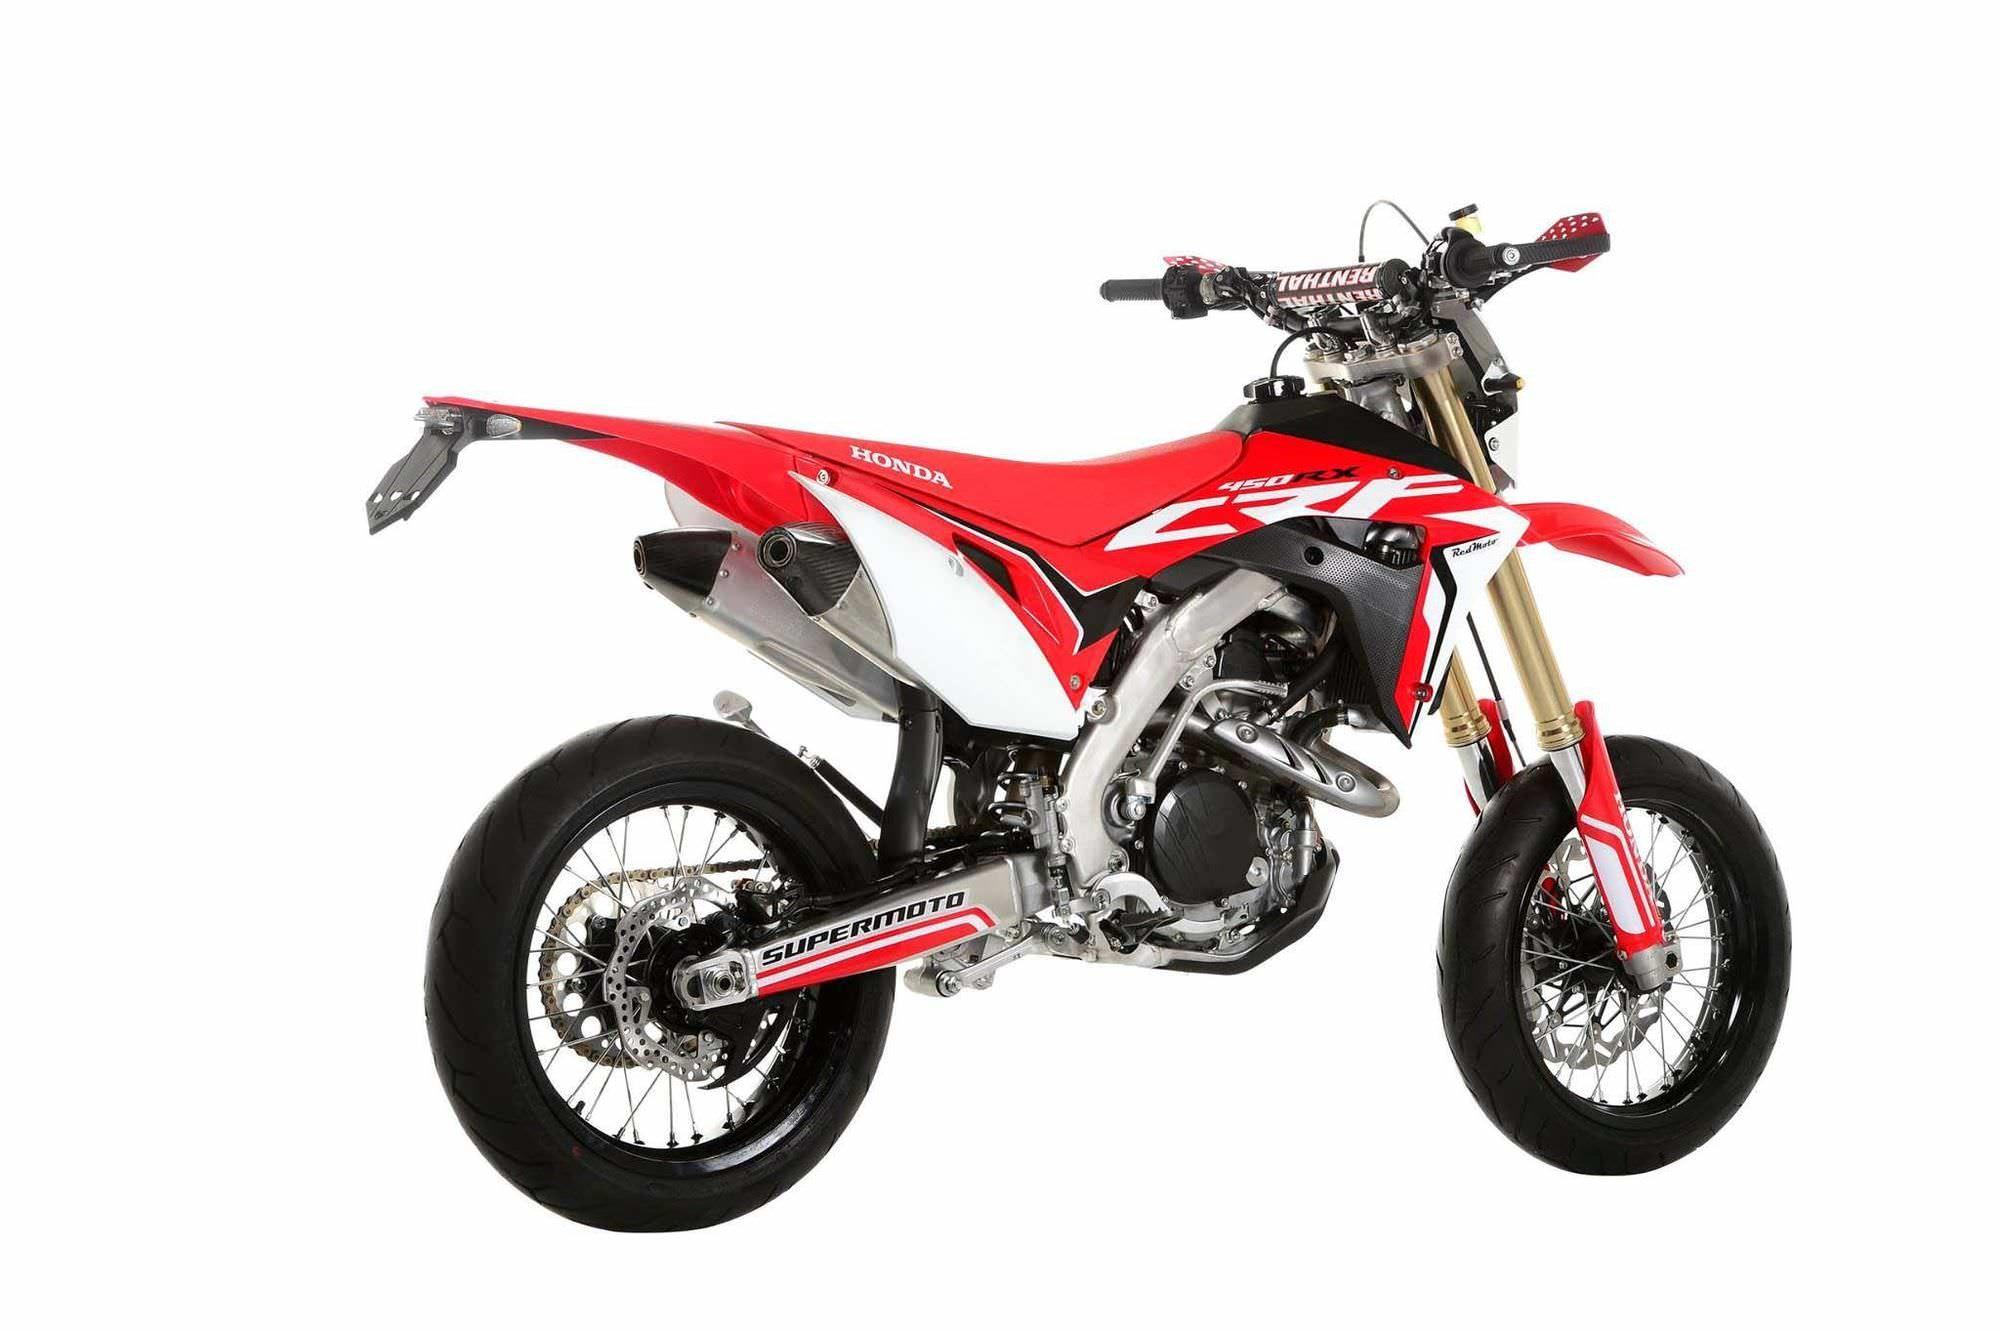 2017 Honda Crf450r Supermoto Motard Bike Motorcycle Review Specs Crf450x Crf500r Crf500x Crf Models